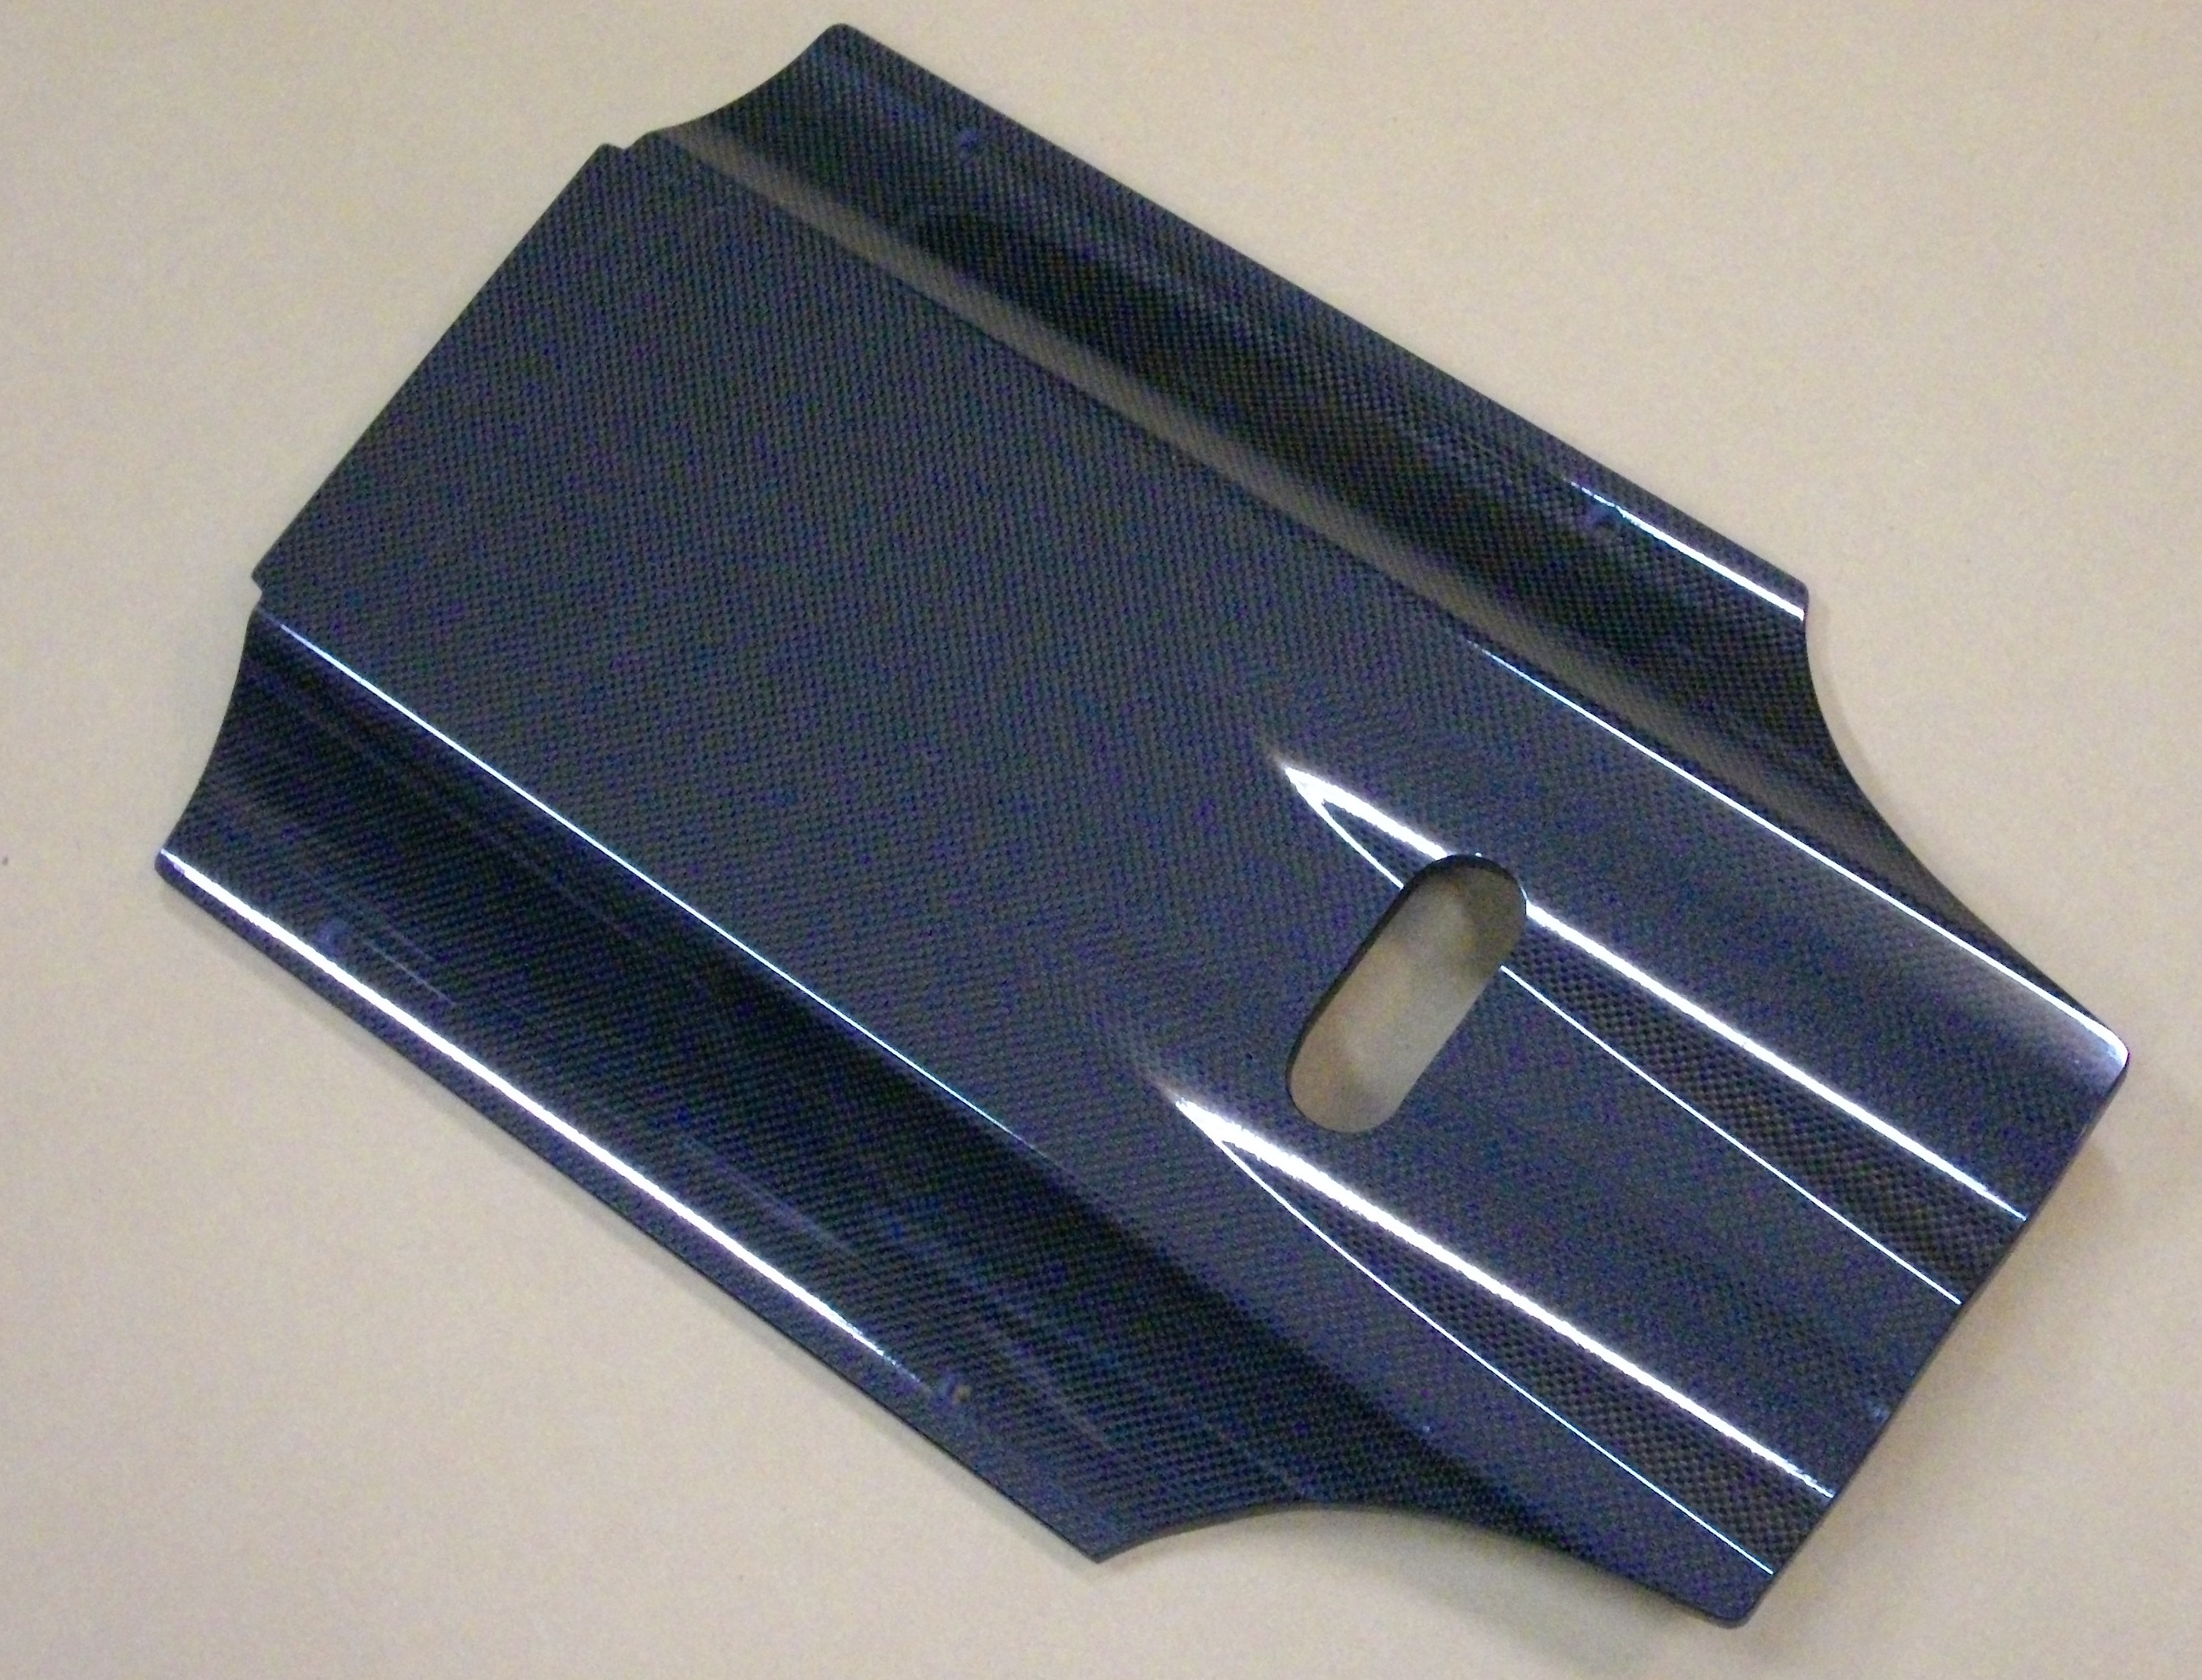 【CM-NX004BK】CRAFTSMAN'S TUKASA PLATE +82mm BLKCK